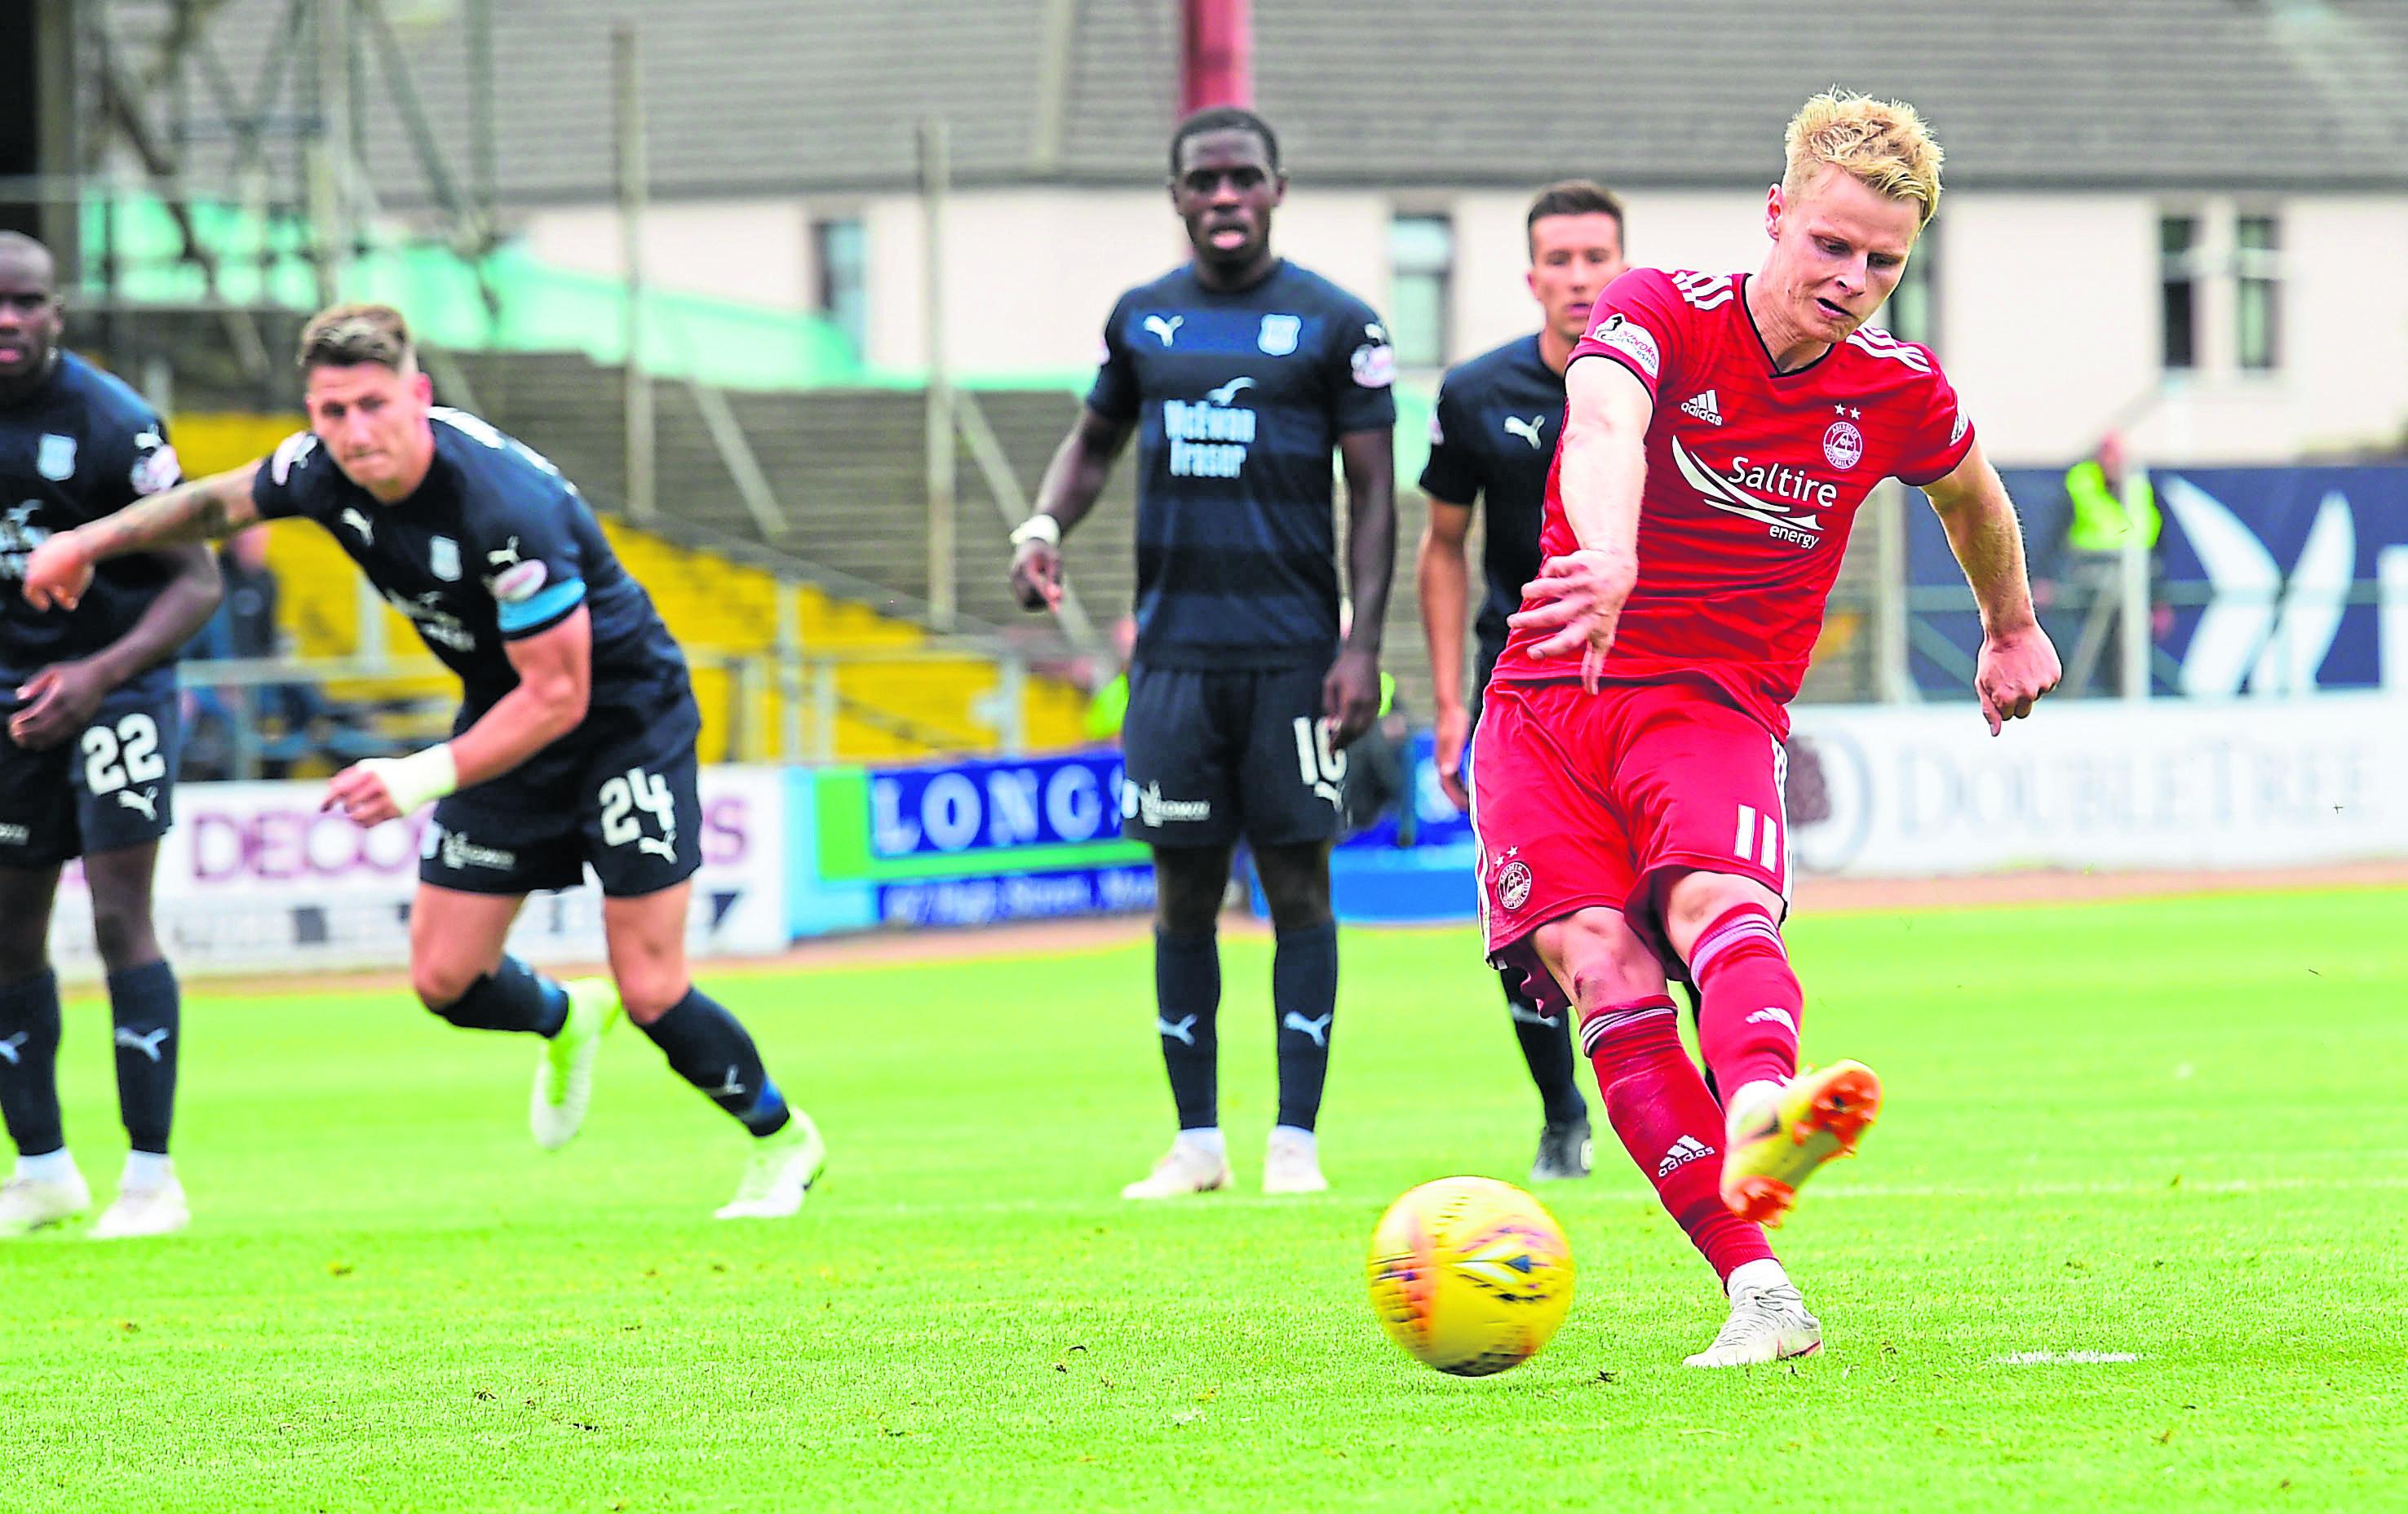 Aberdeen's Gary Mackay Steven scores to make it 1-0.